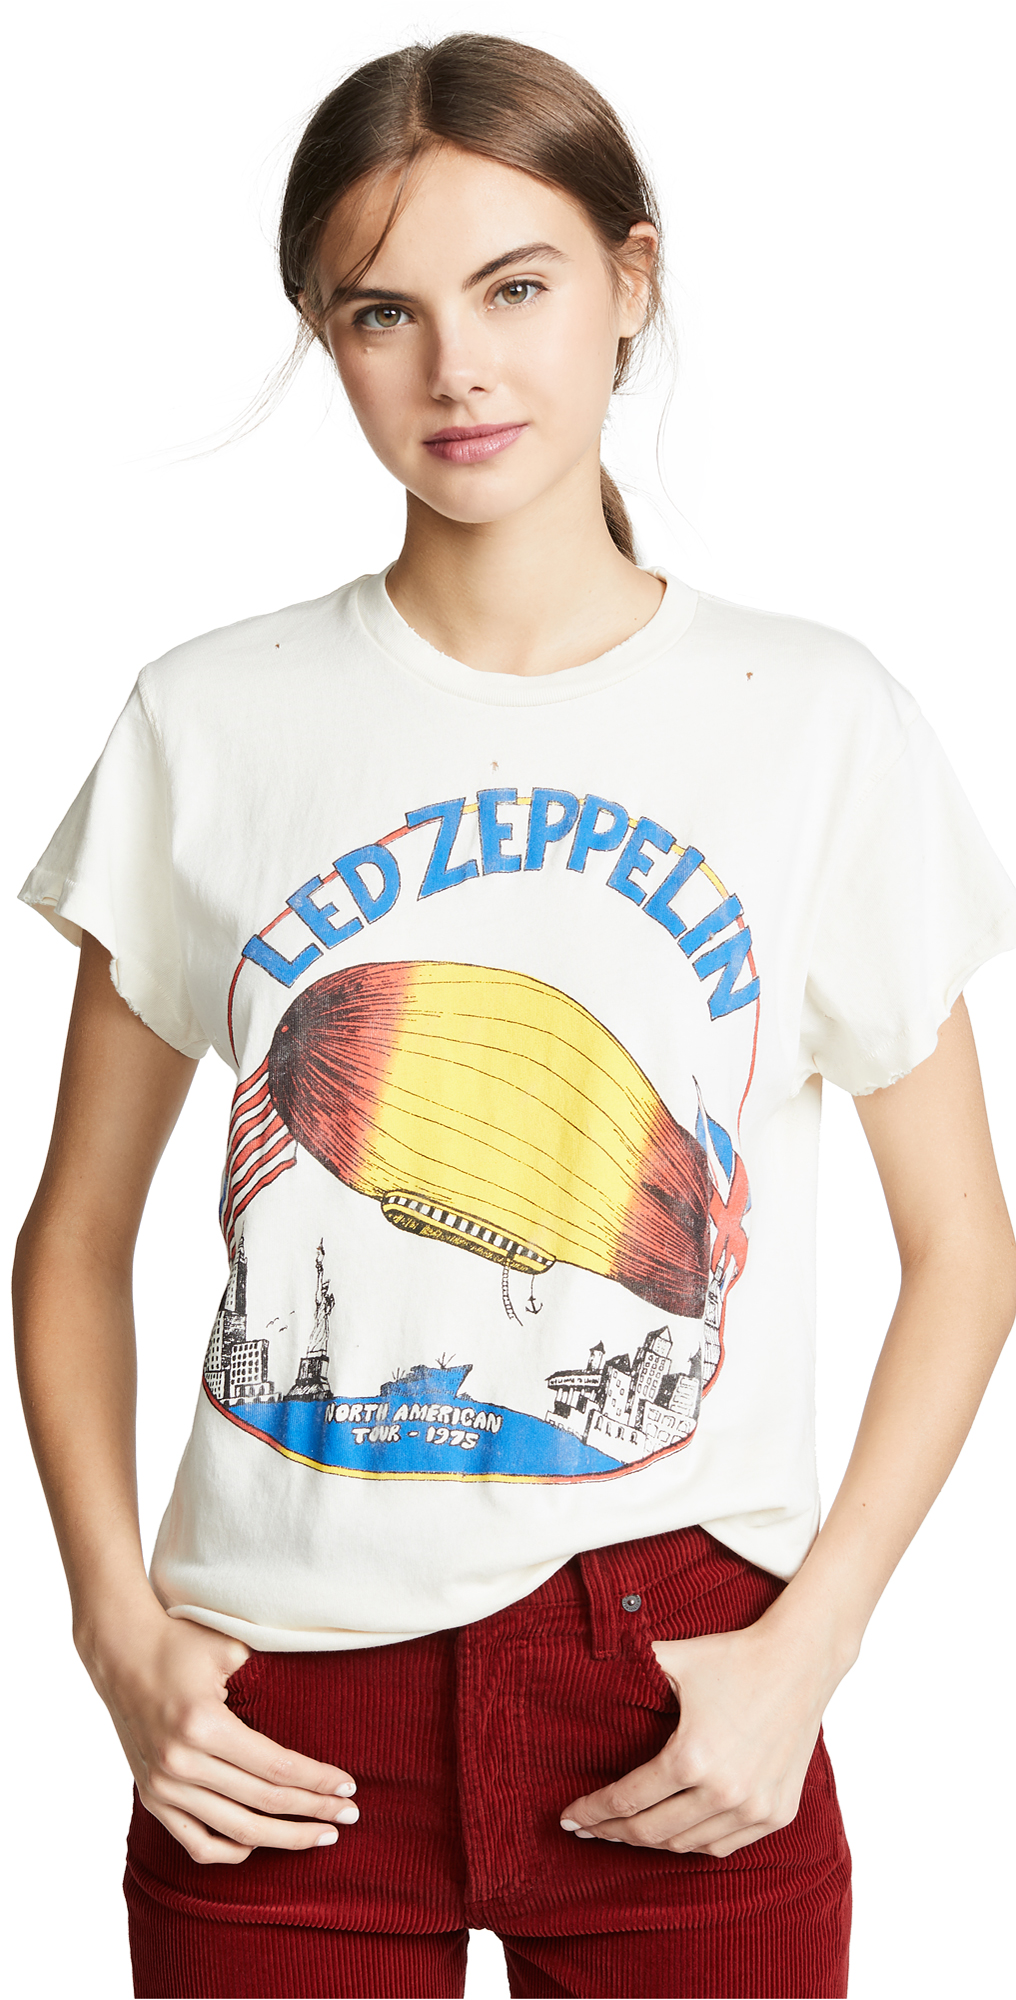 MADEWORN ROCK Led Zeppelin Tee